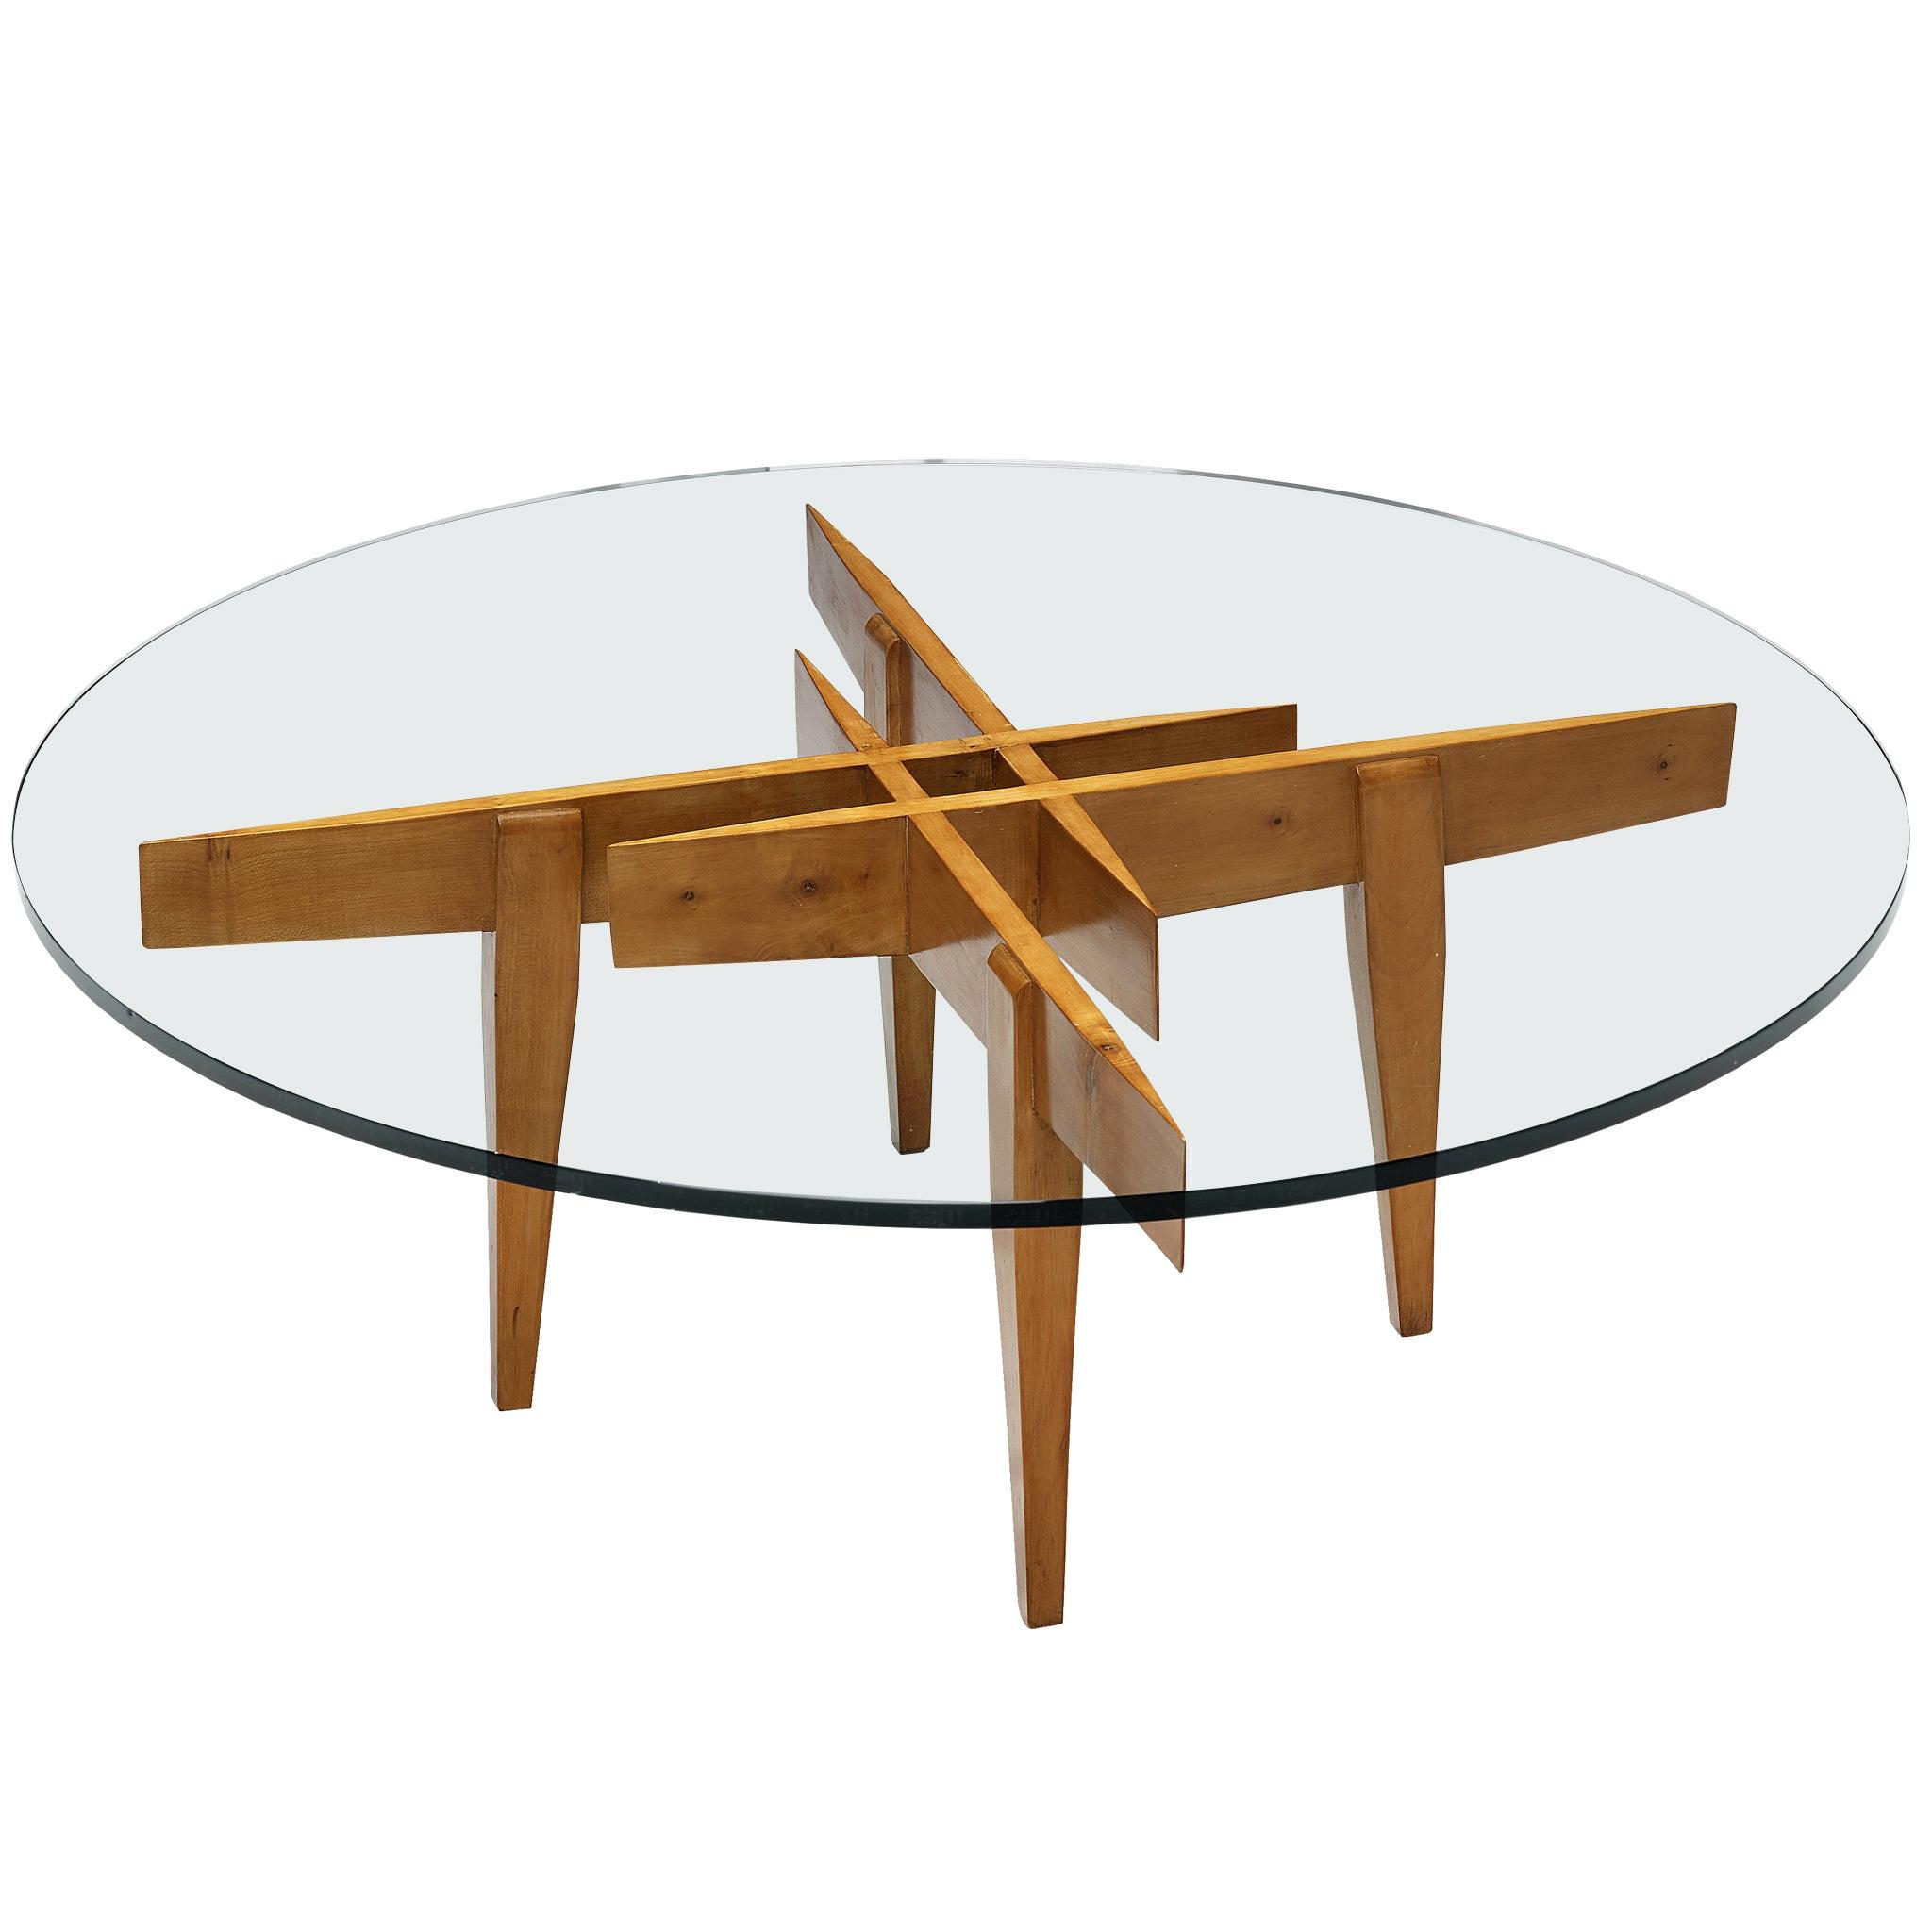 Gio Ponti for Giordano Chiesa Sculptural Coffee Table in Maple